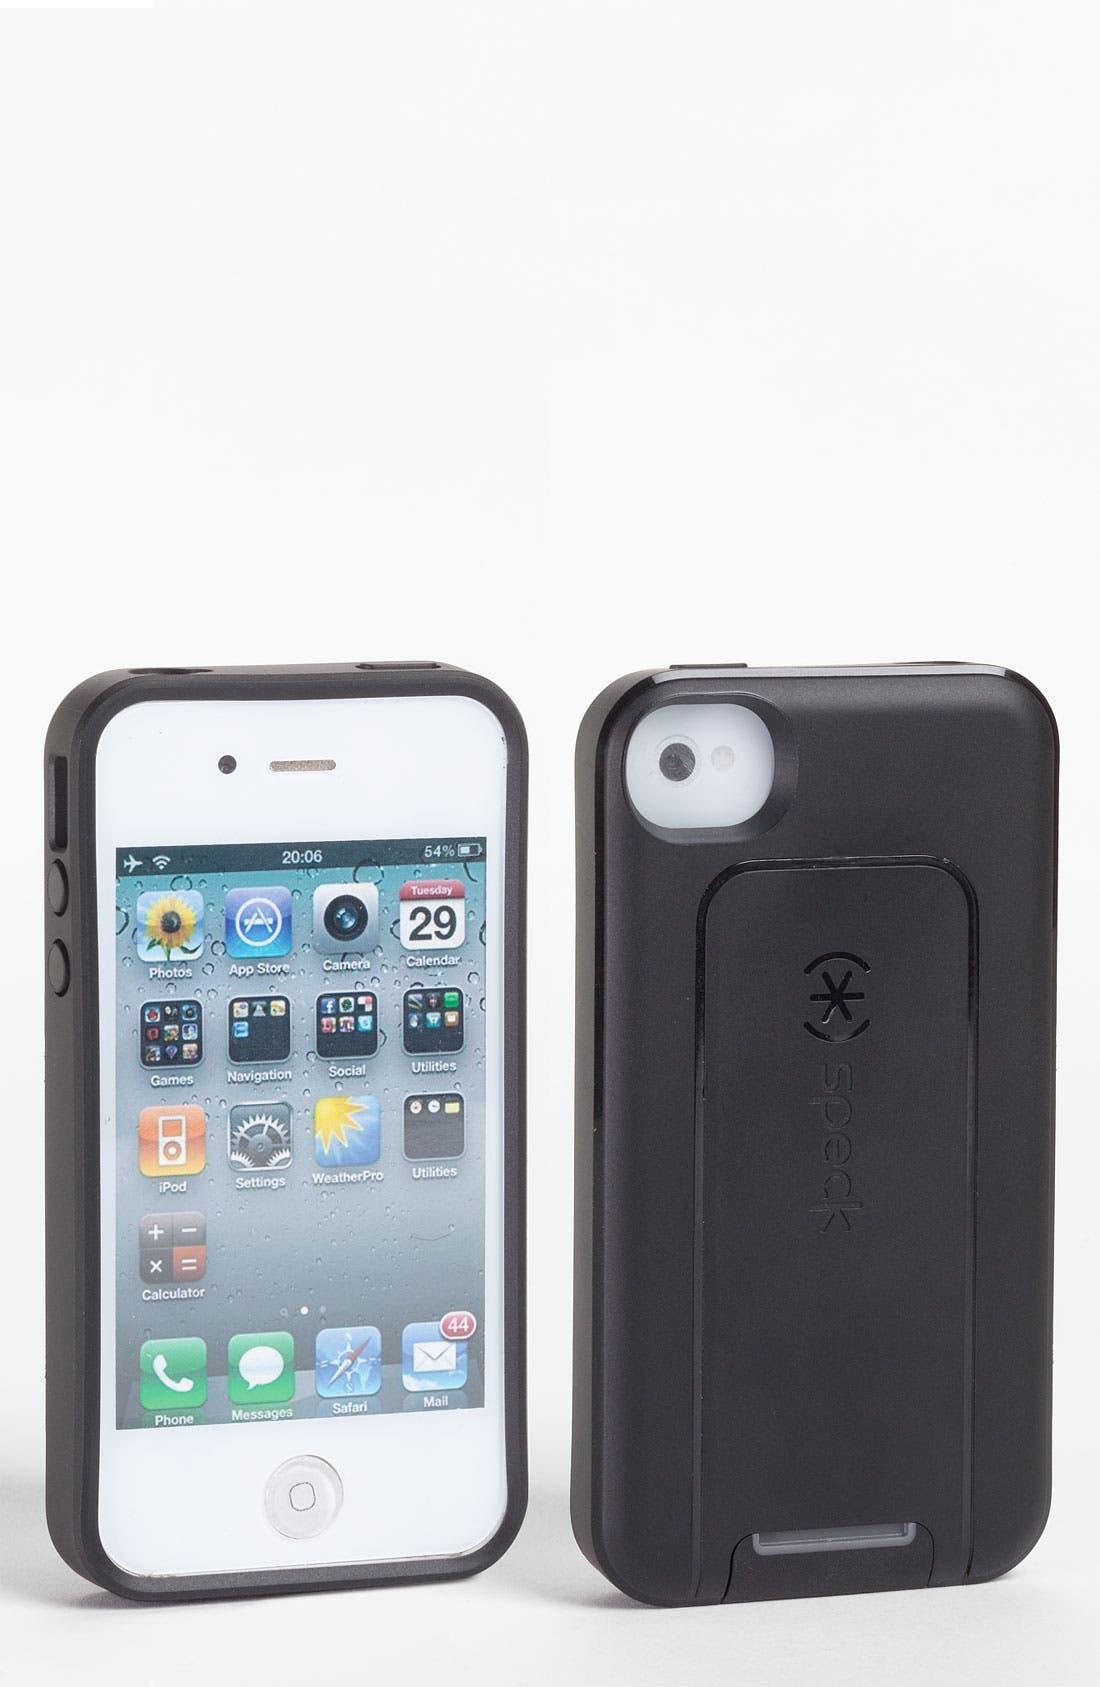 Main Image - Speck 'SmartFlex View' iPhone 4 & 4S Case